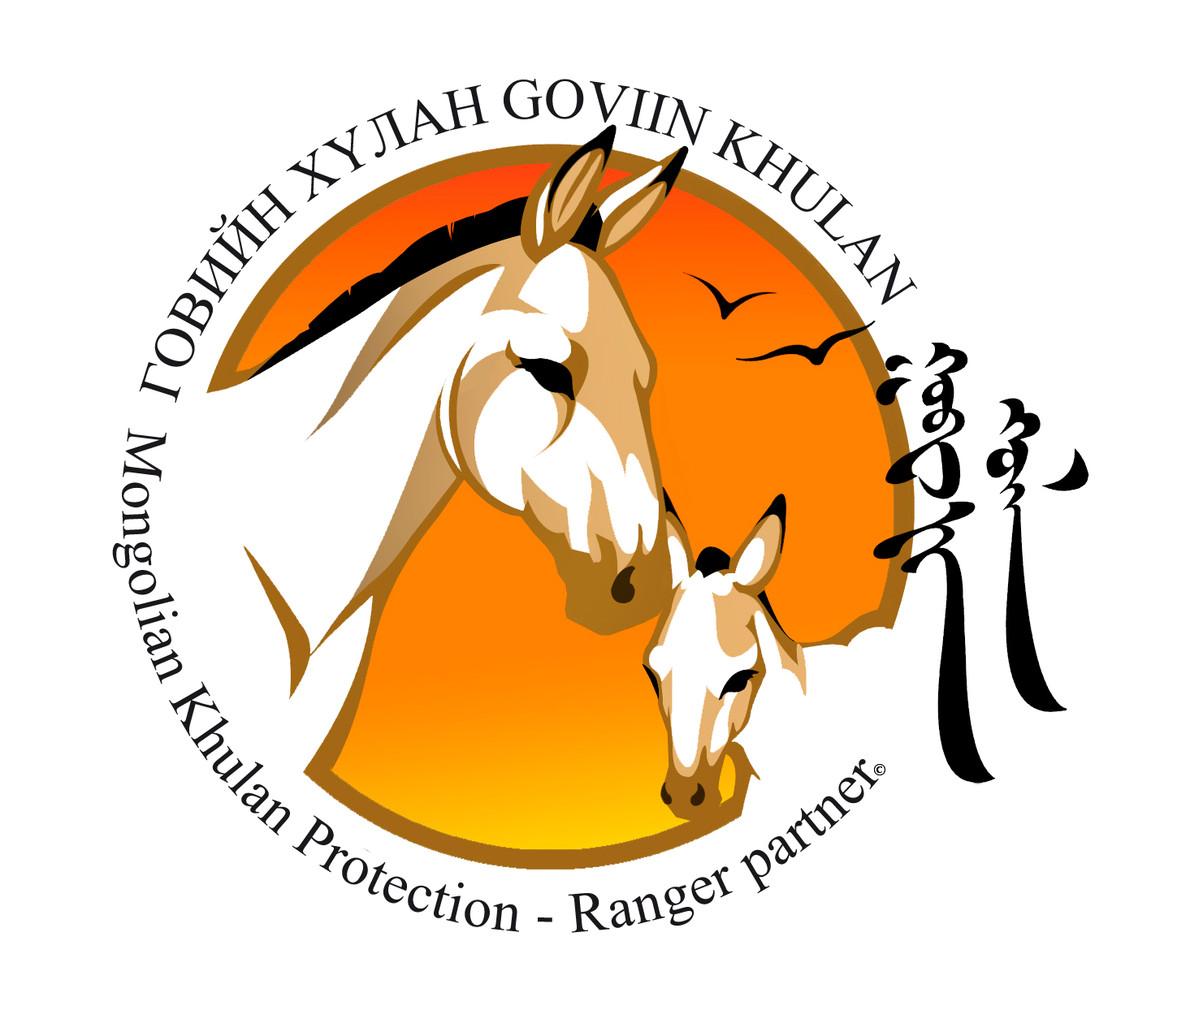 version anglaise du logo